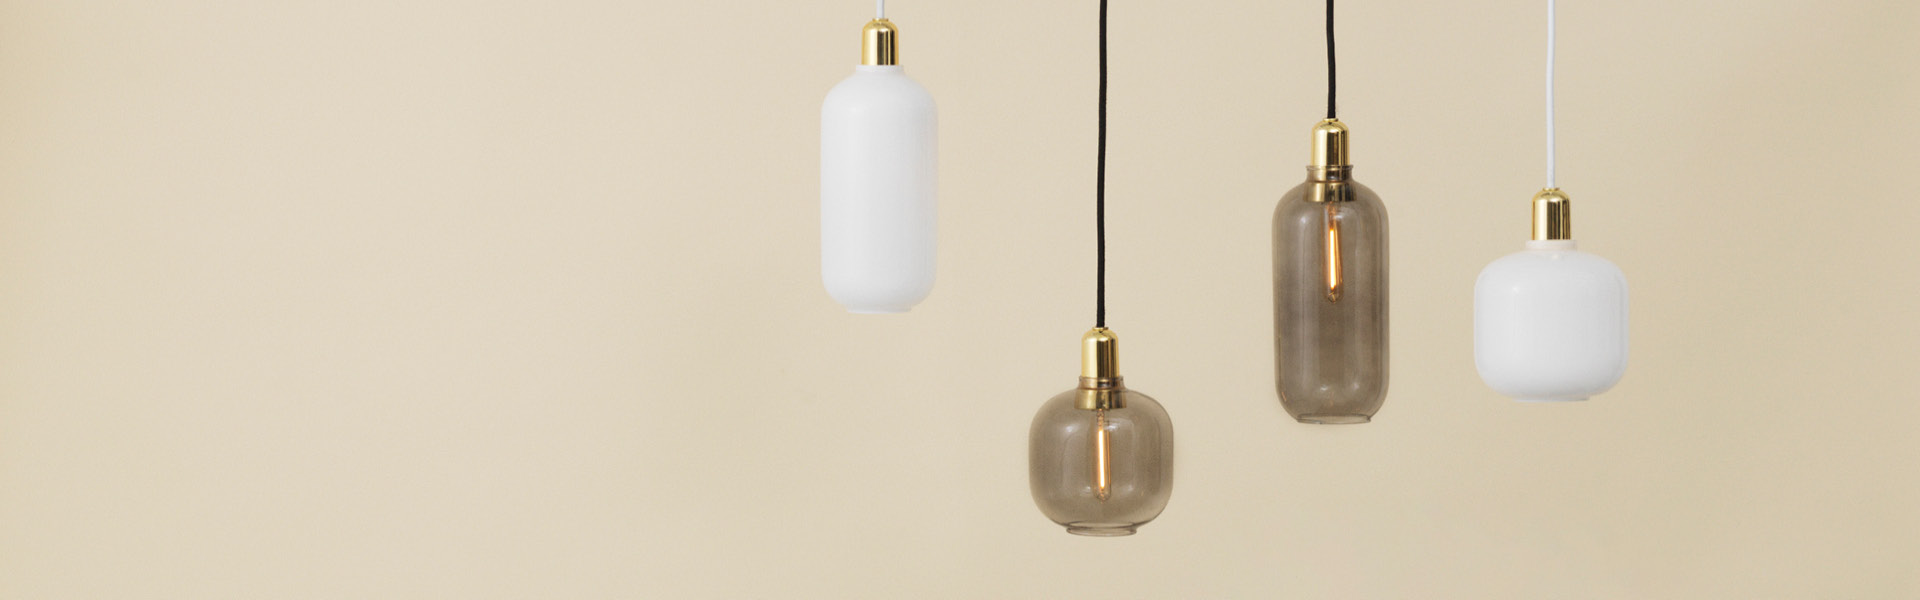 Belysning-lamper-taklampe-Normann-Copenhagen.jpg